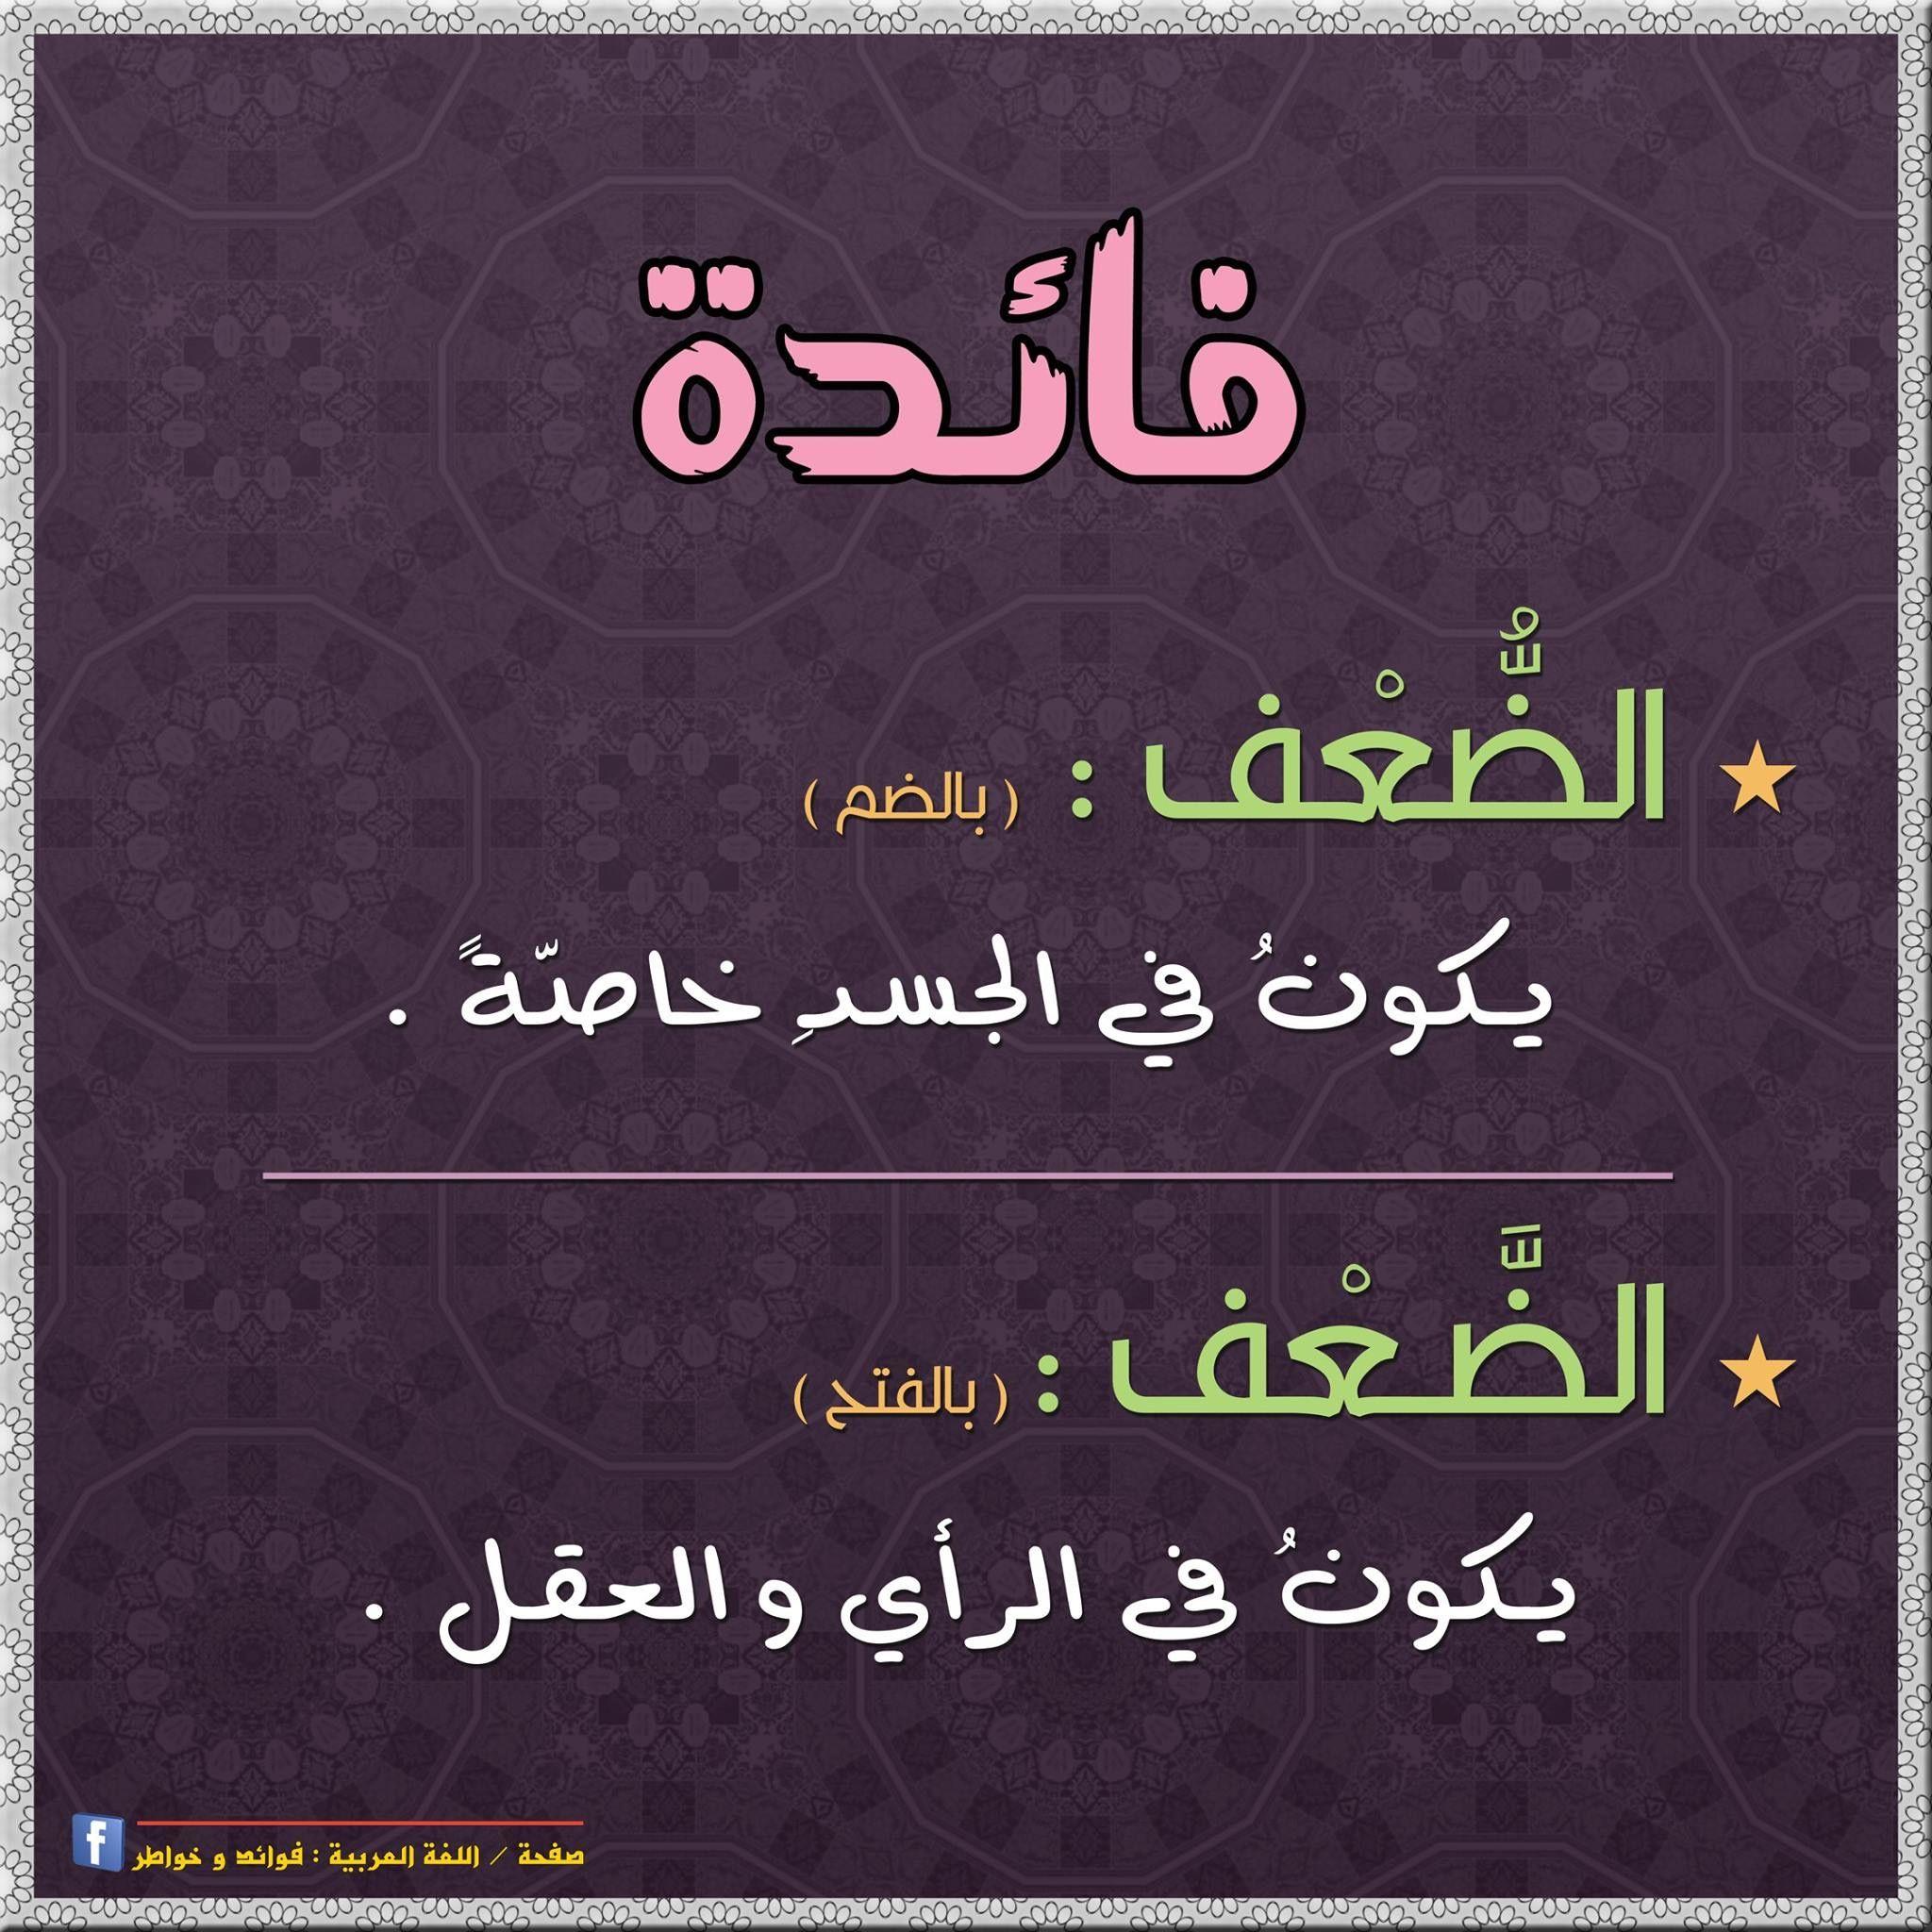 الض عف الض عف Language Quotes Beautiful Arabic Words Cool Words